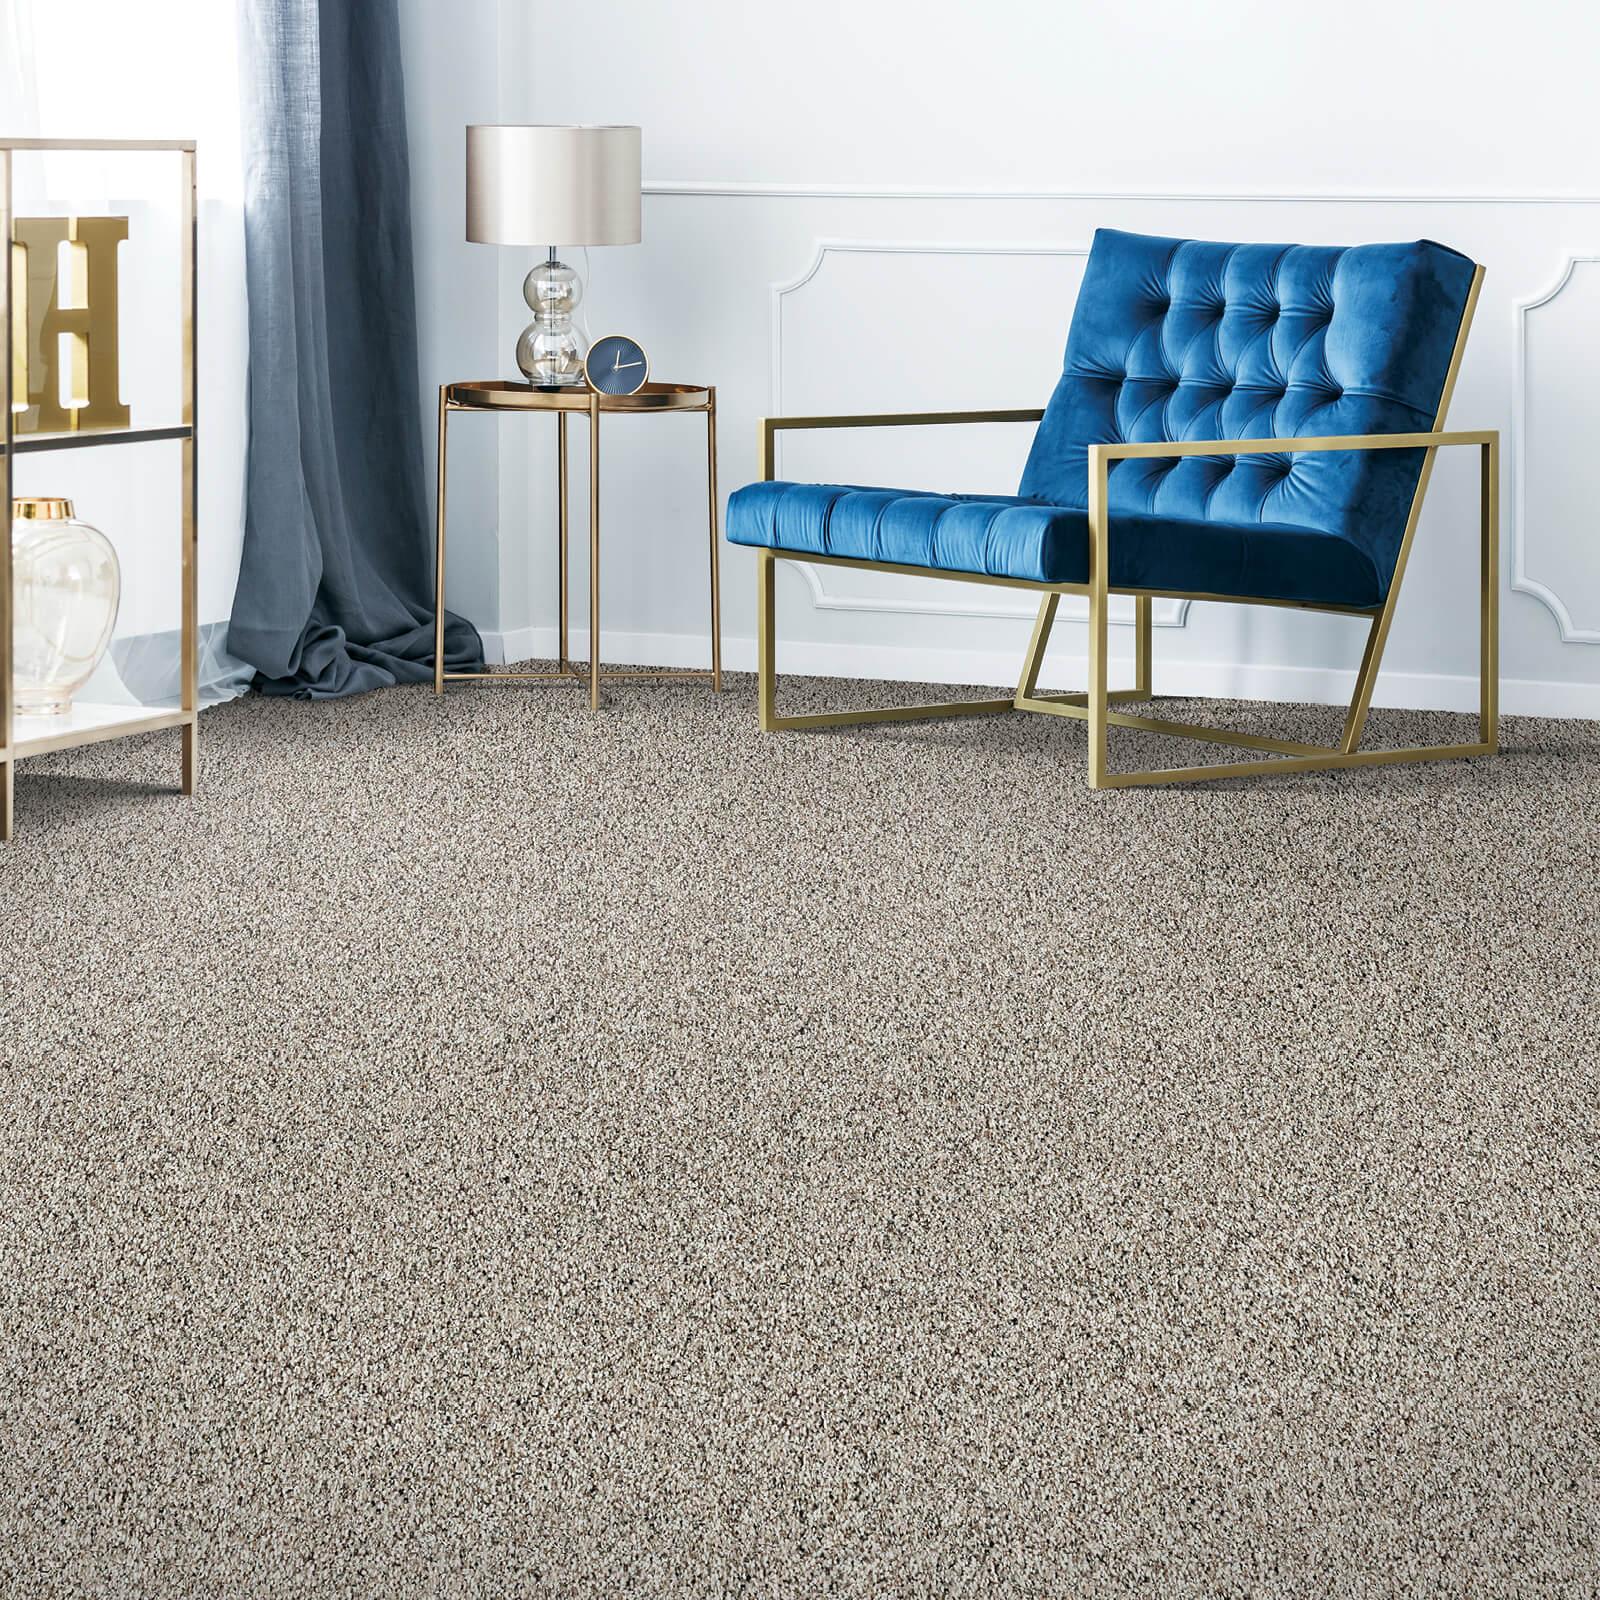 Remarkable carpet vision | J/K Carpet Center, Inc